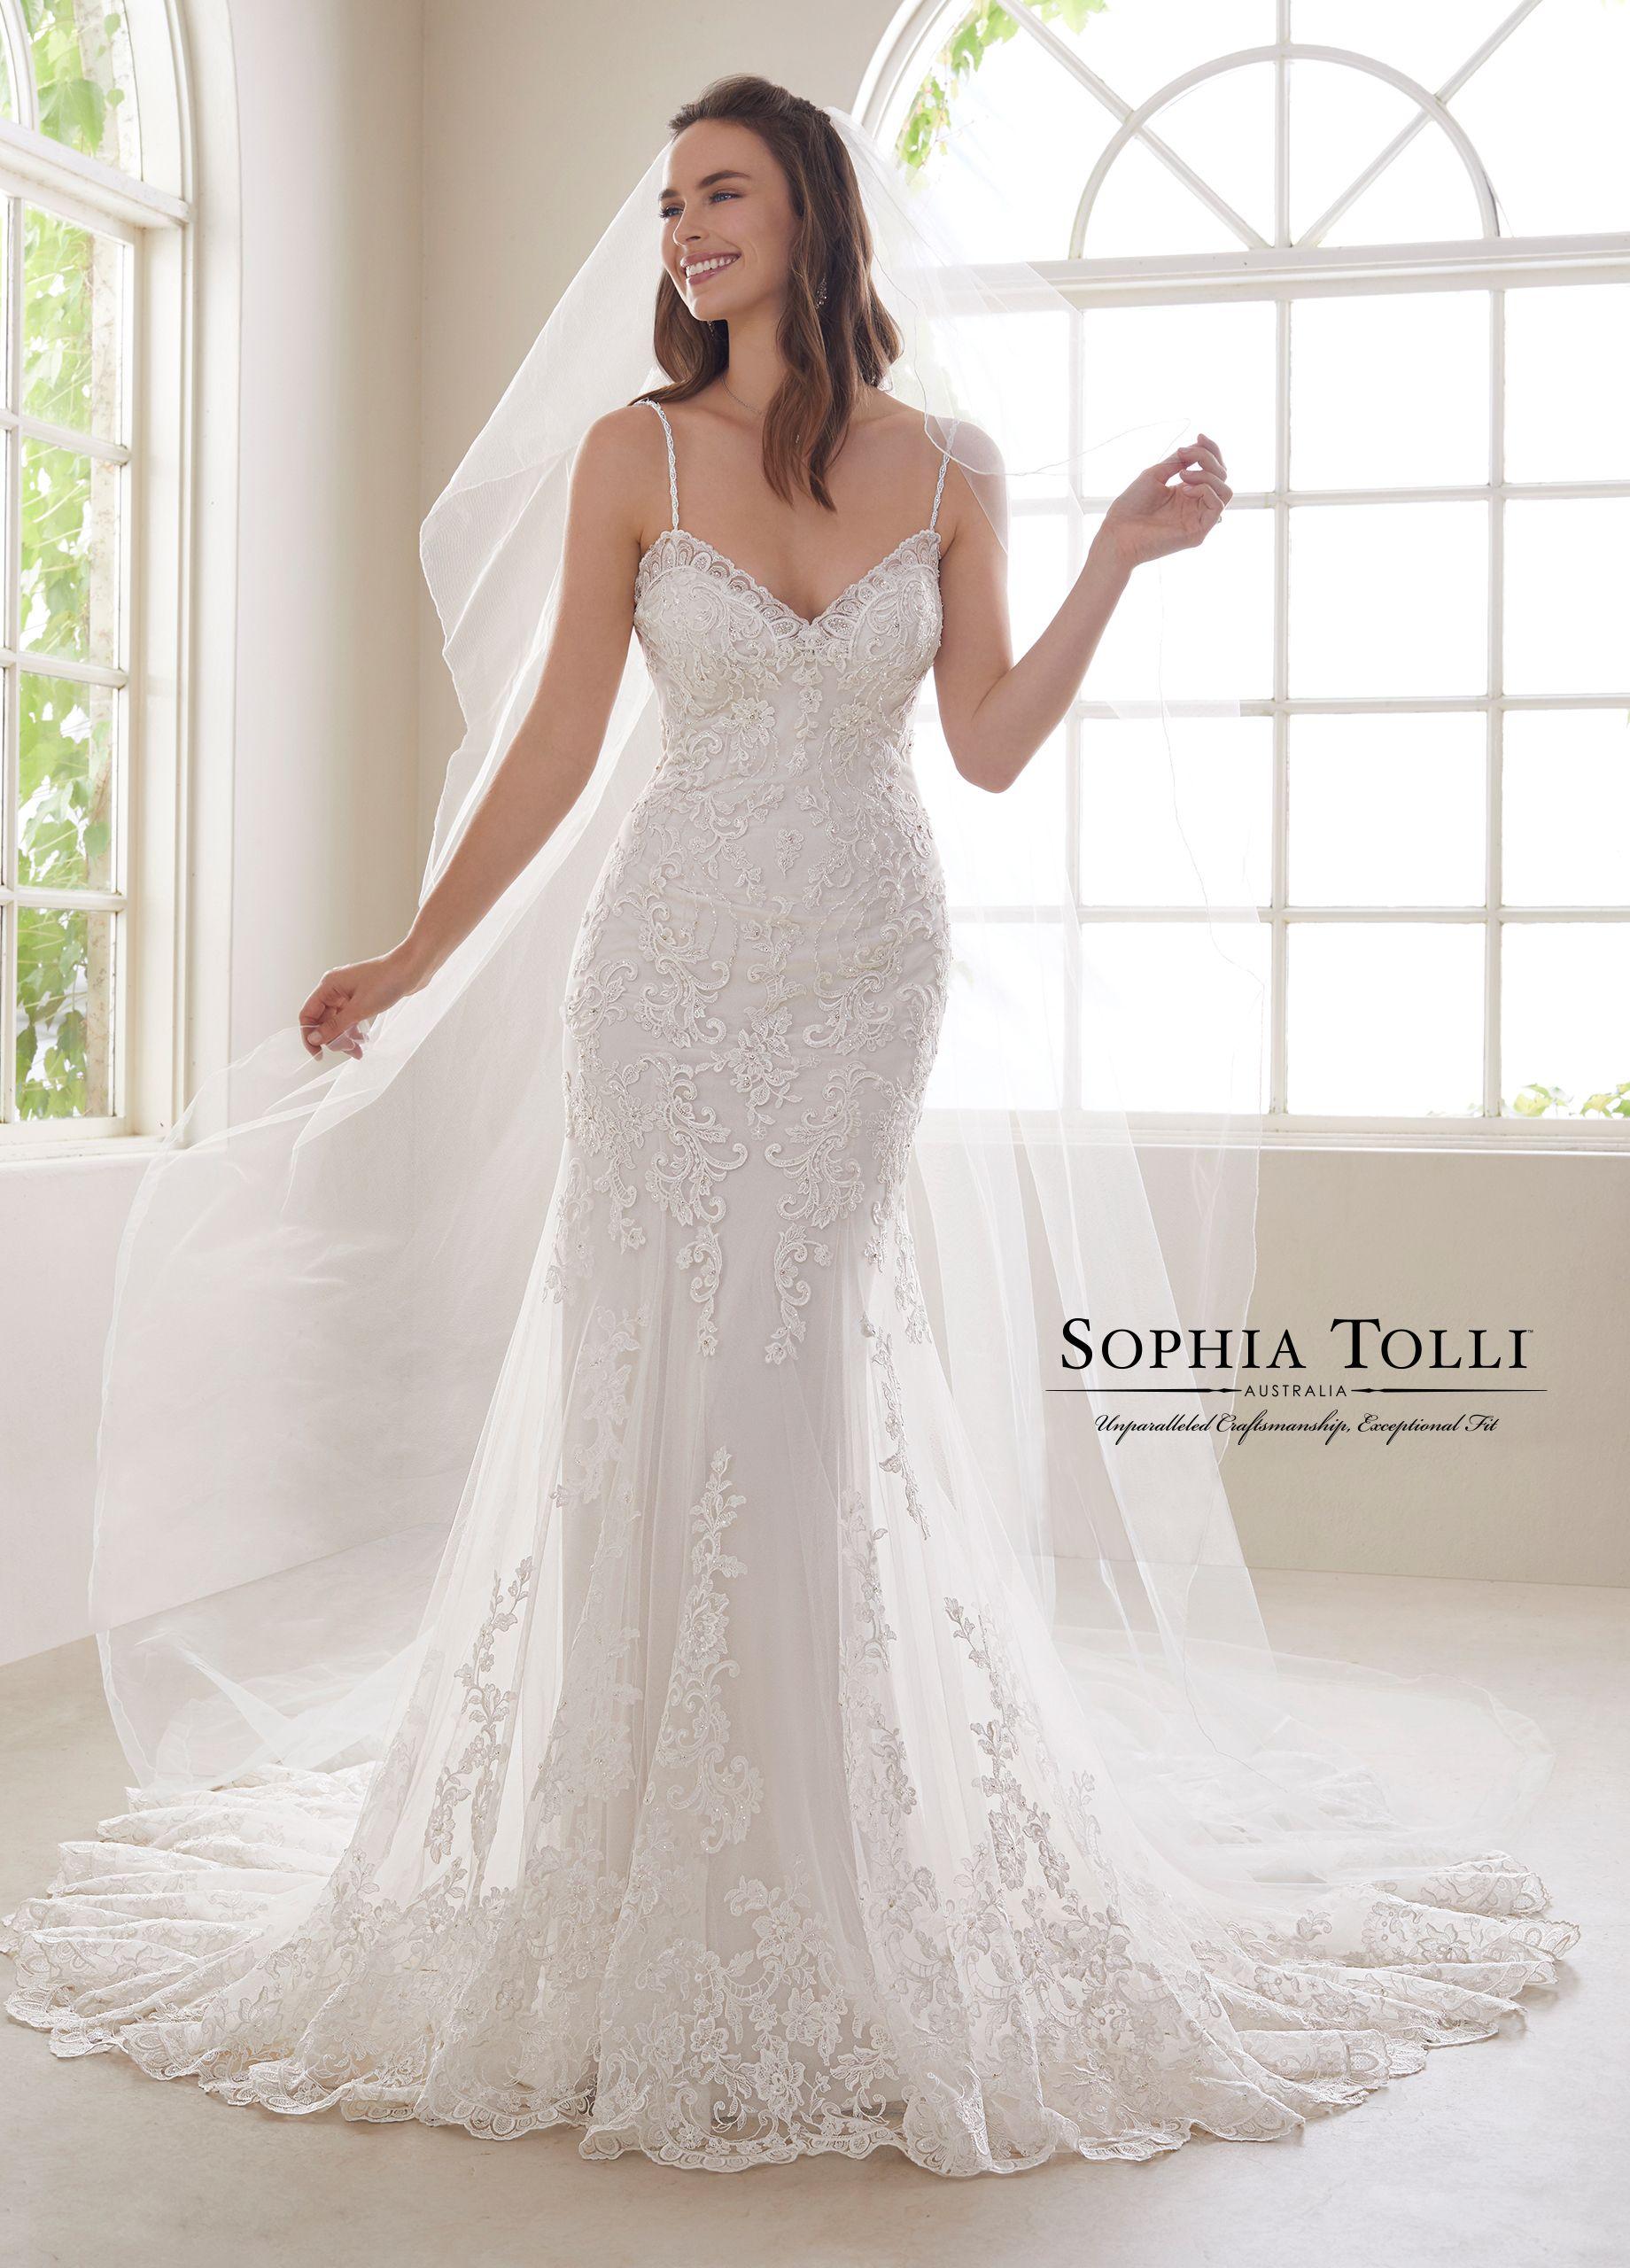 Sophia Tolli Aquamarine Sophia Tolli Wedding Dresses Wedding Dresses Bridal Gowns